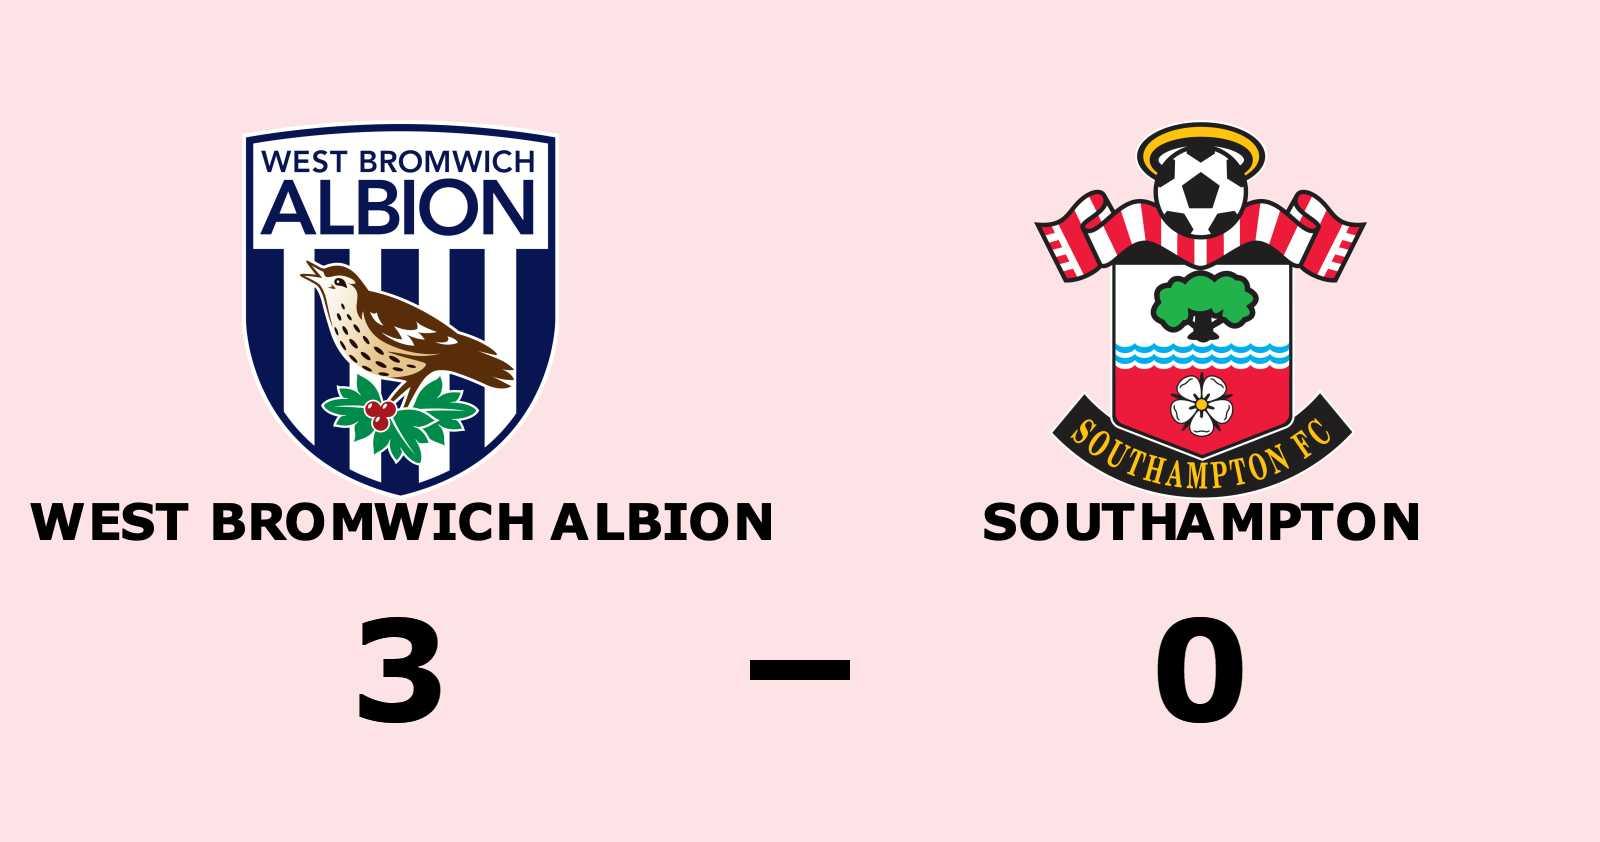 West Bromwich Albion tog kommandot från start mot Southampton